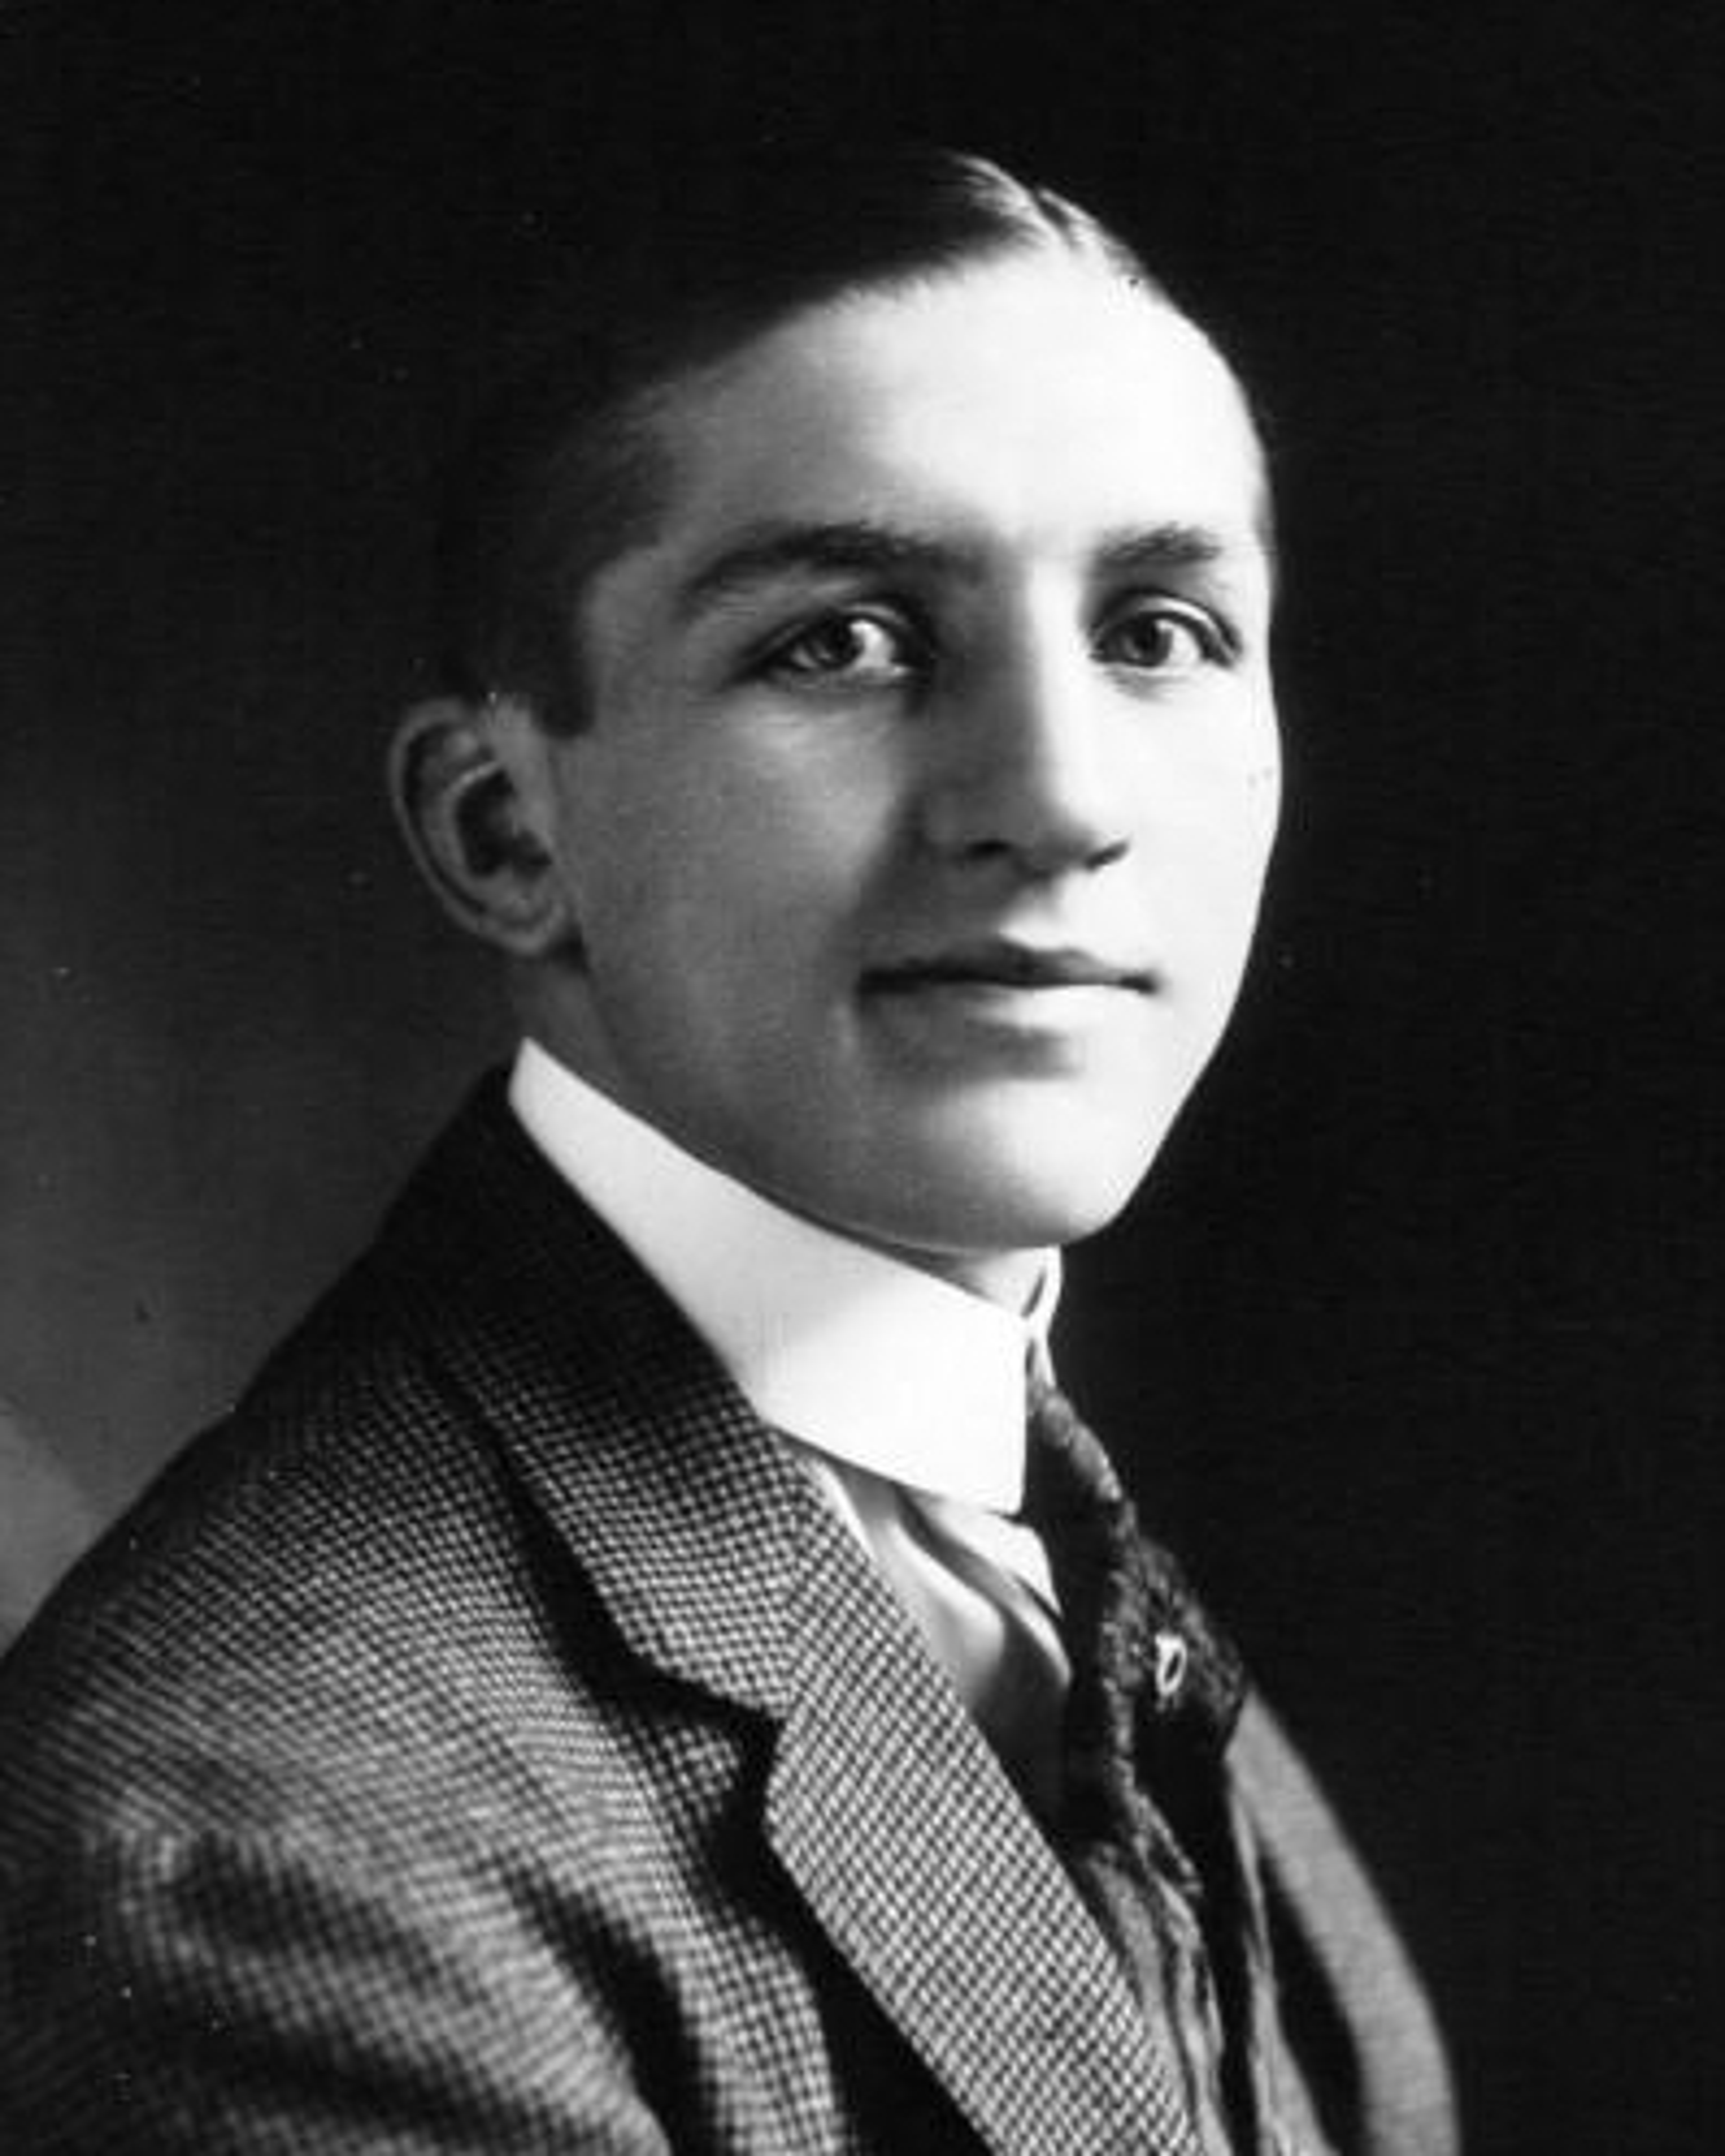 Georges Carpentier salary